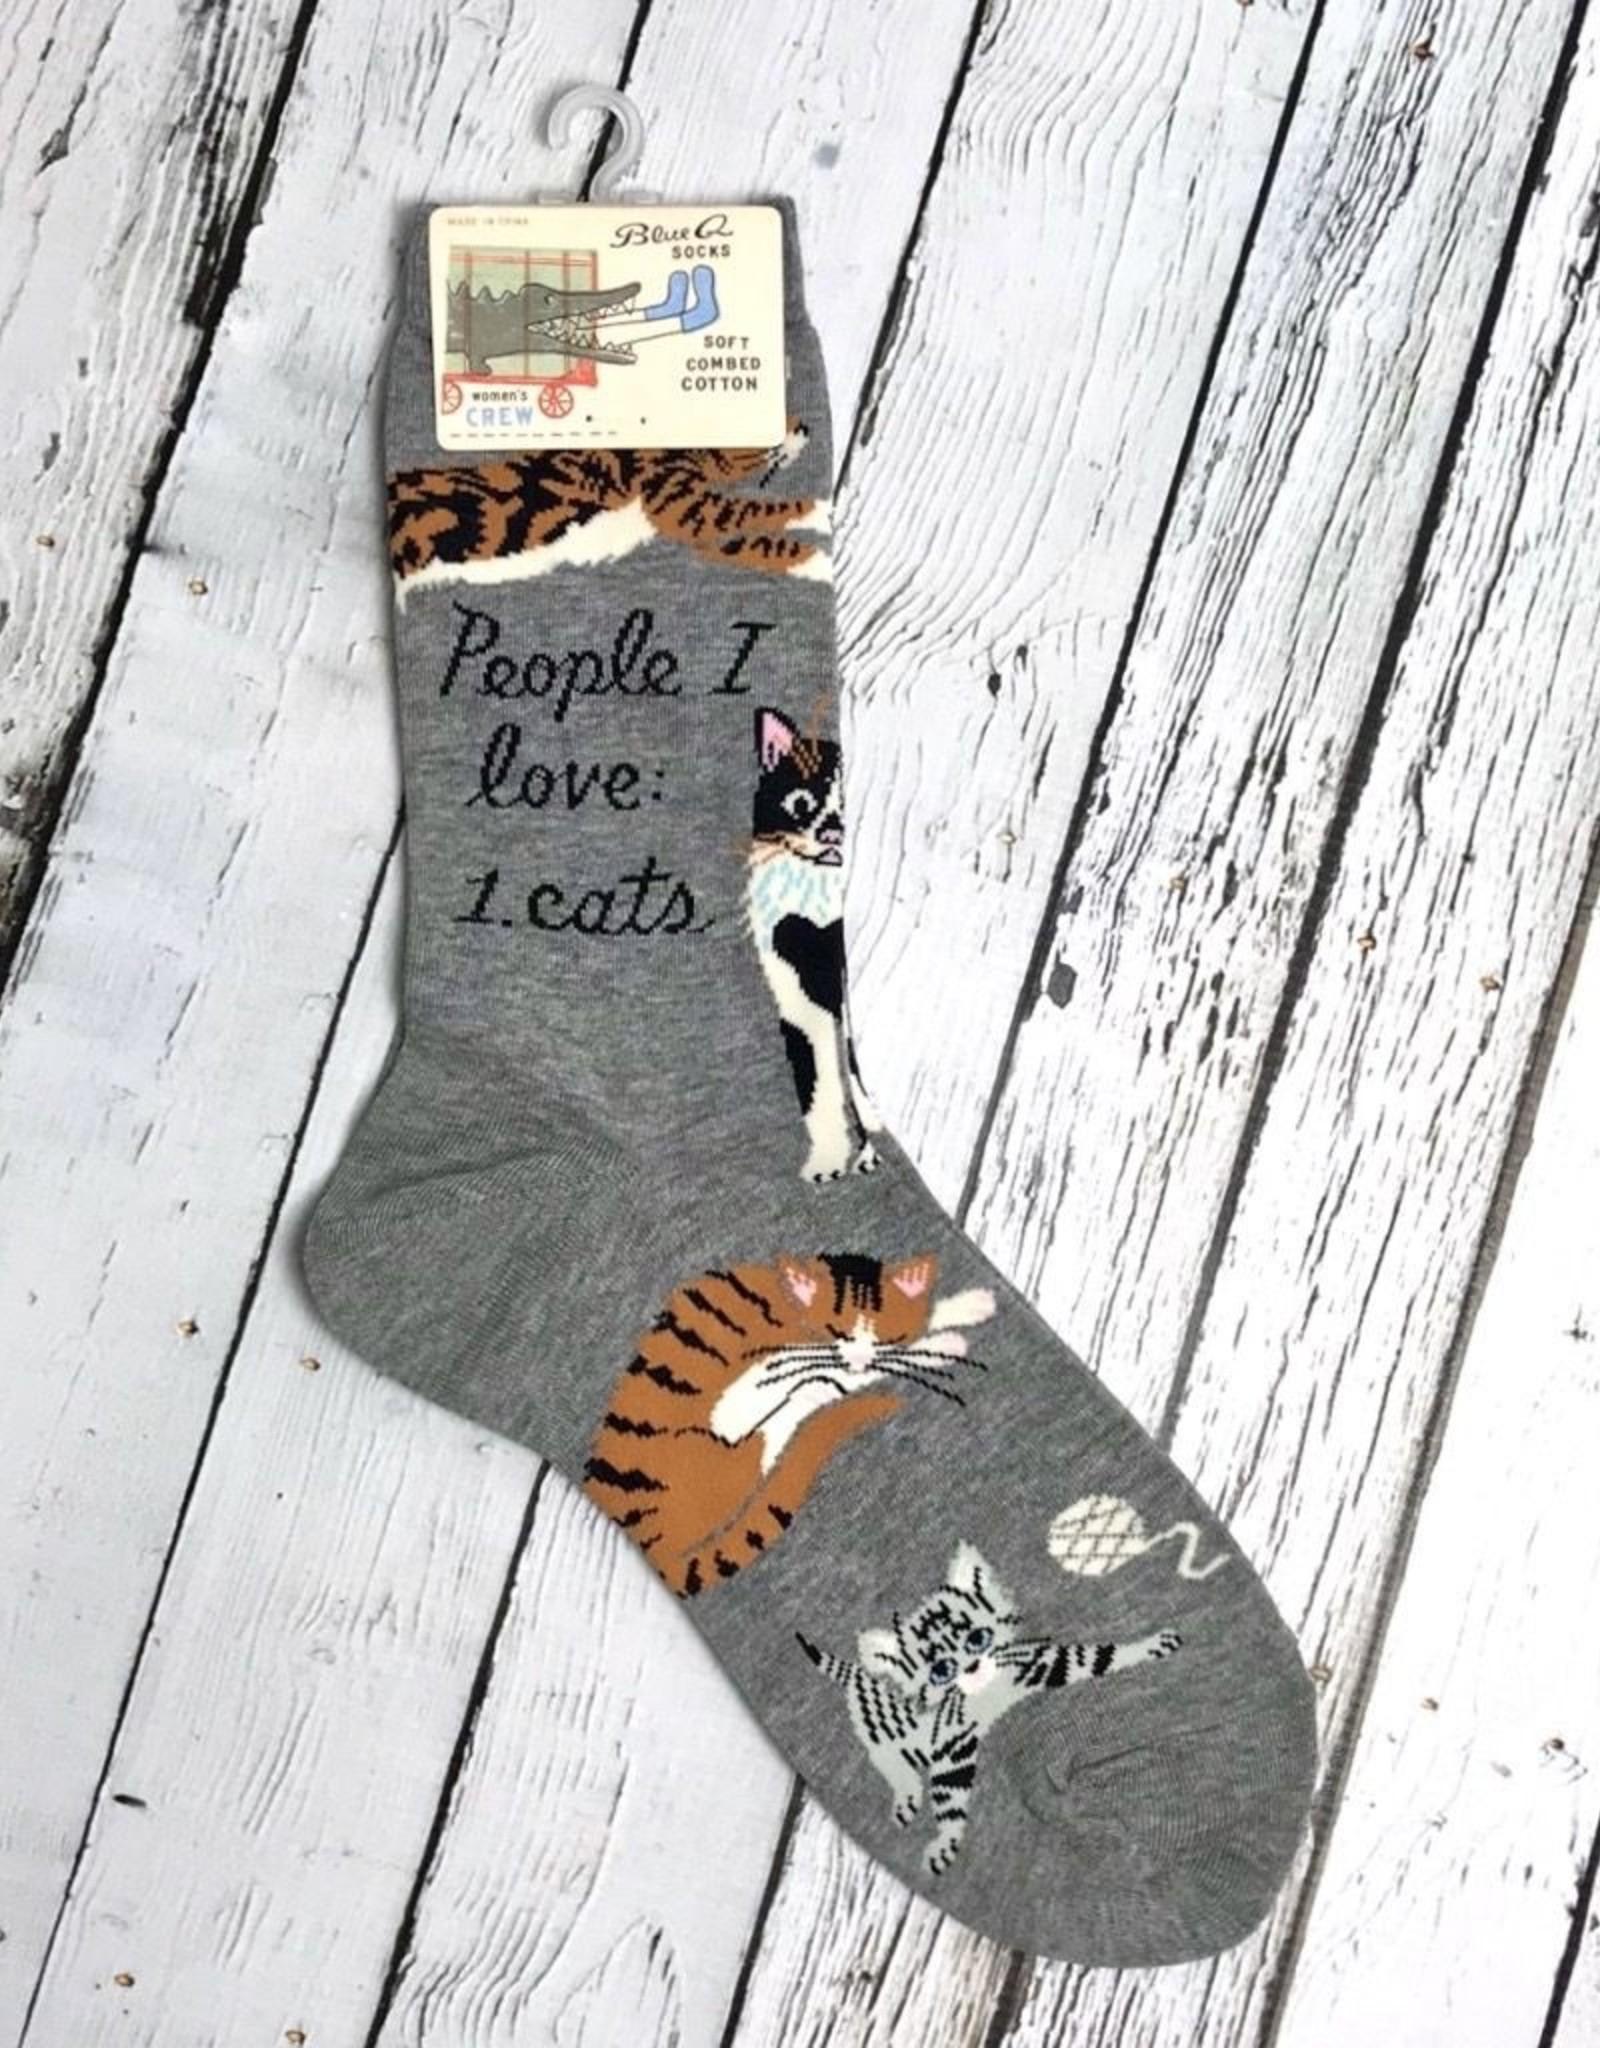 BlueQ People I Love: CATS Women's Crew Socks